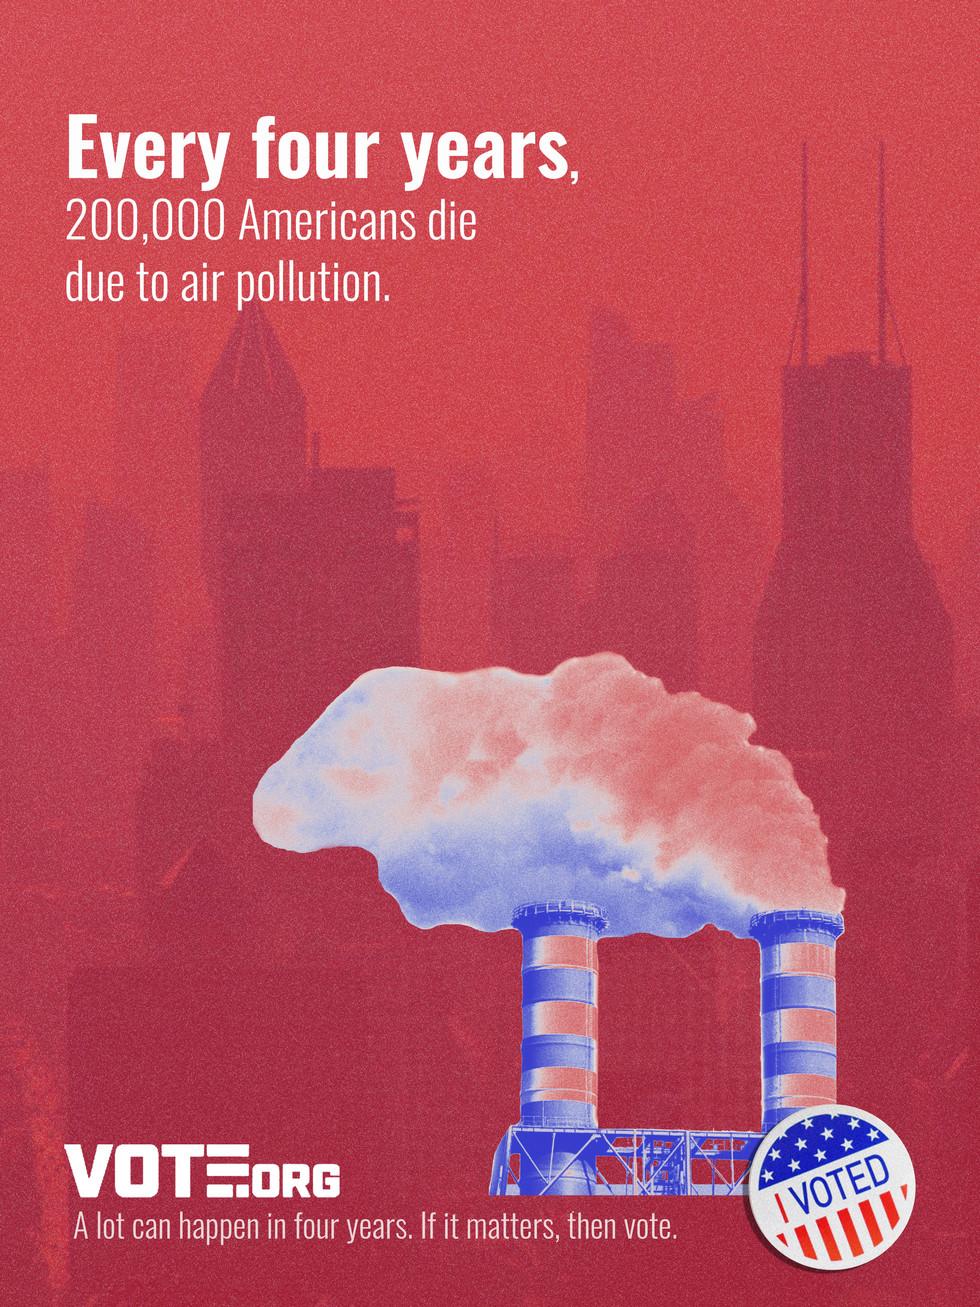 smokestacks.portfolio.jpg